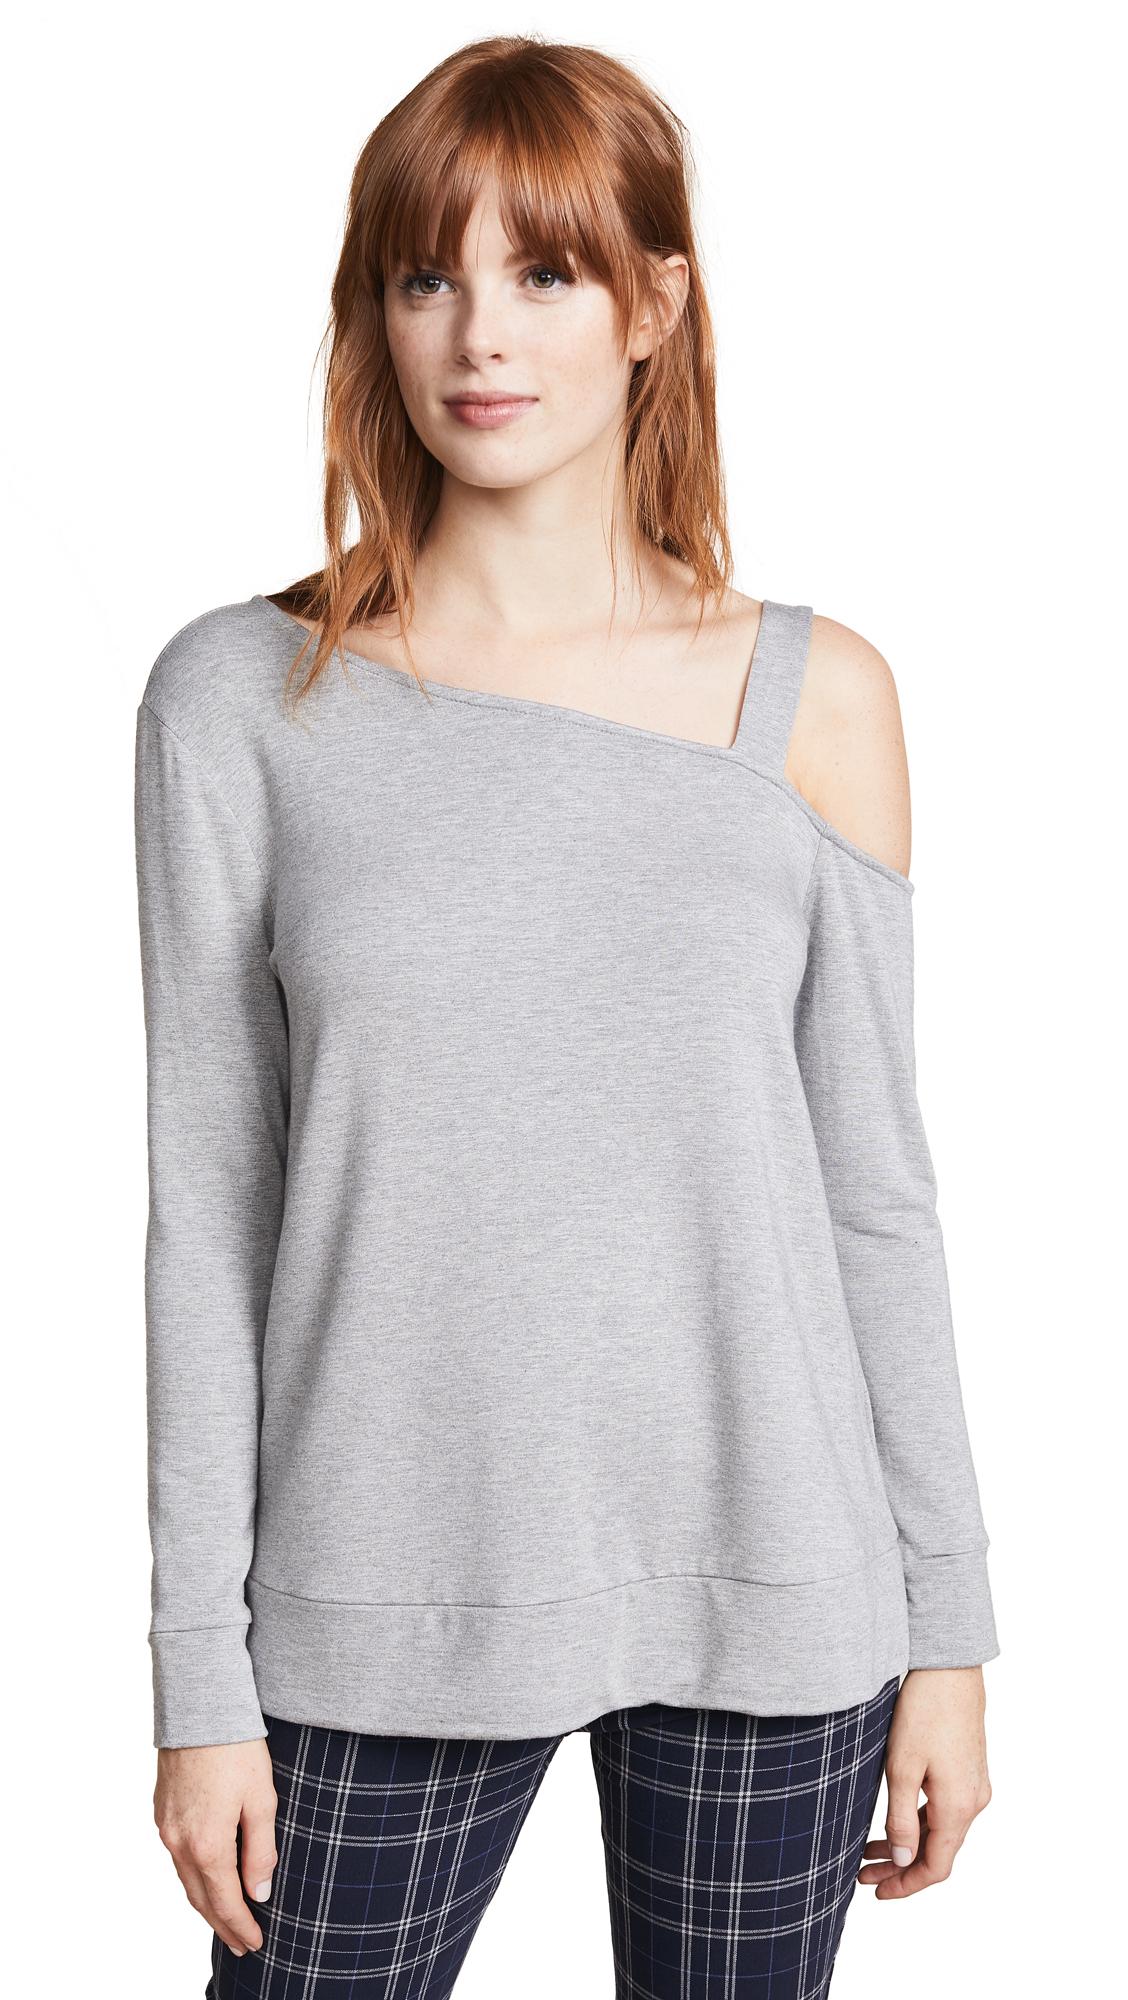 BB Dakota Pick Up The Phone Sweater - Light Heather Grey